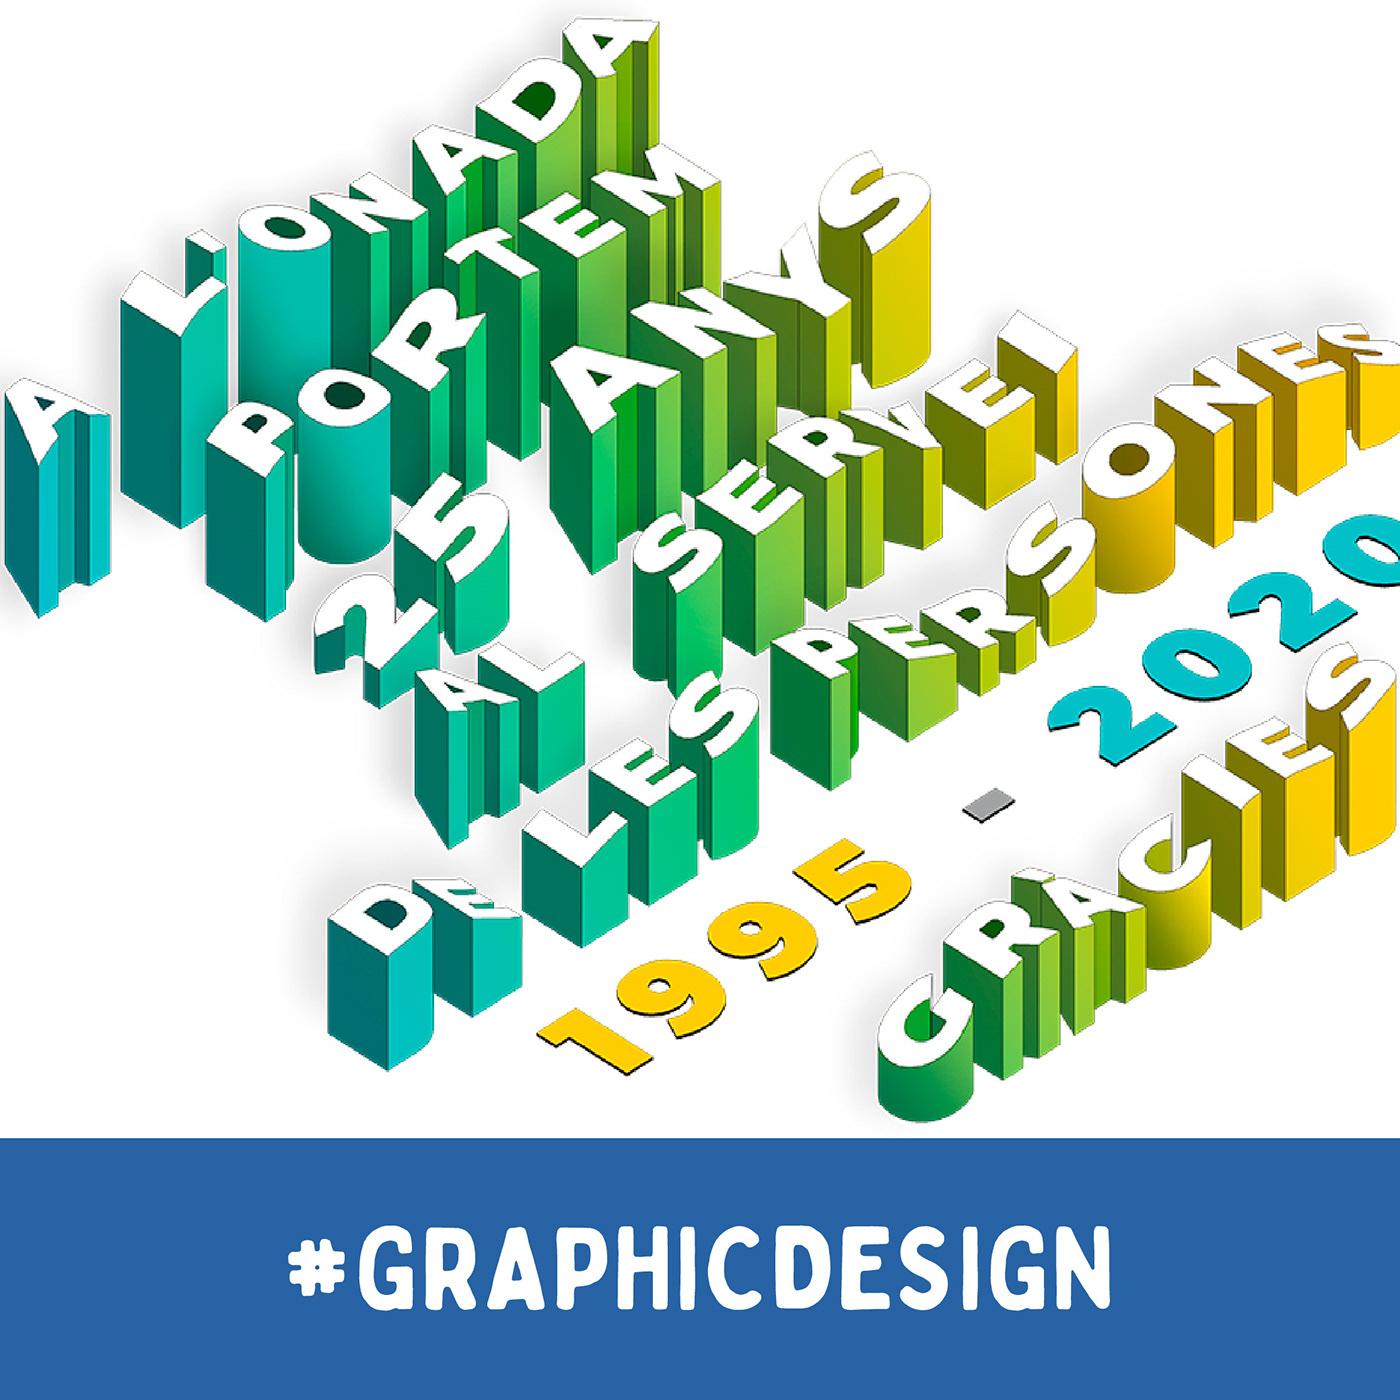 Isometric 3D Typography (25th anniversary L'Onada)